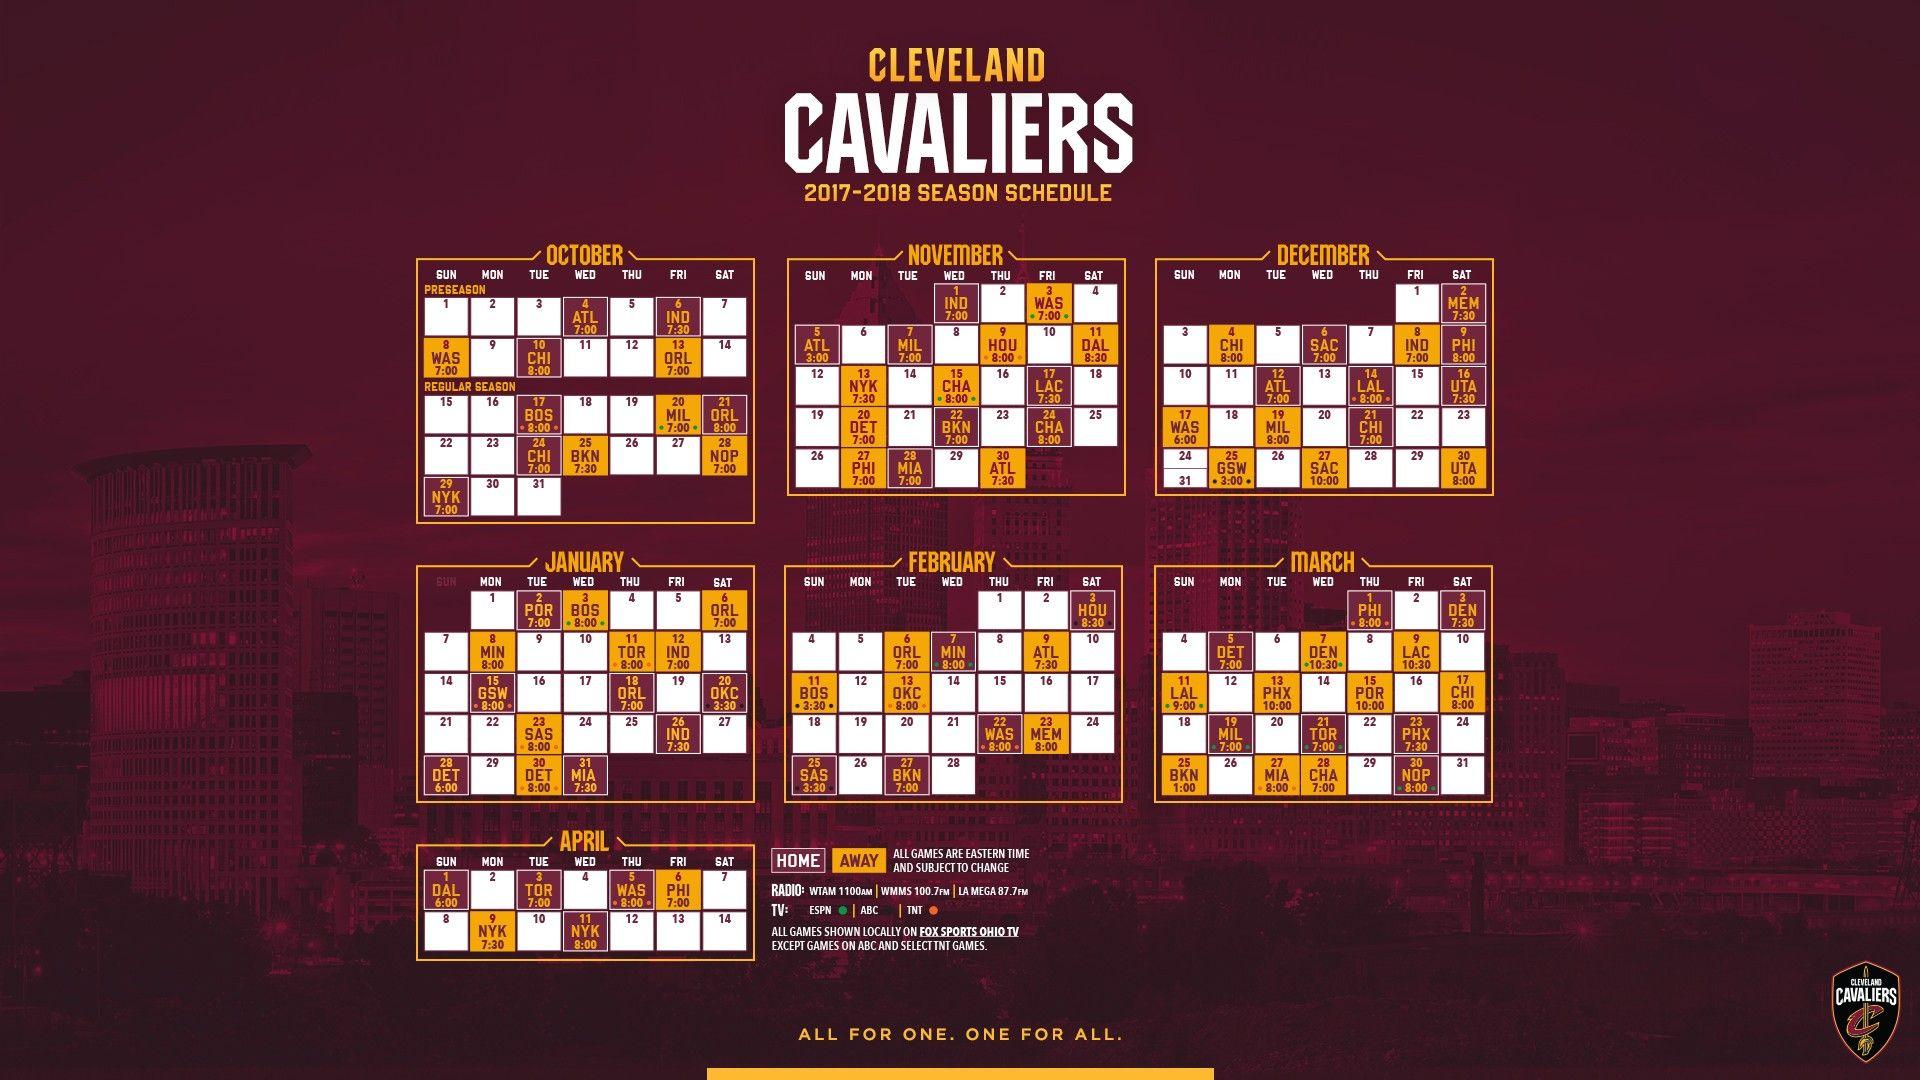 Cavs Schedule 2020.Cavs Schedule 2019 Cleveland Cavaliers Tickets 2019 2020